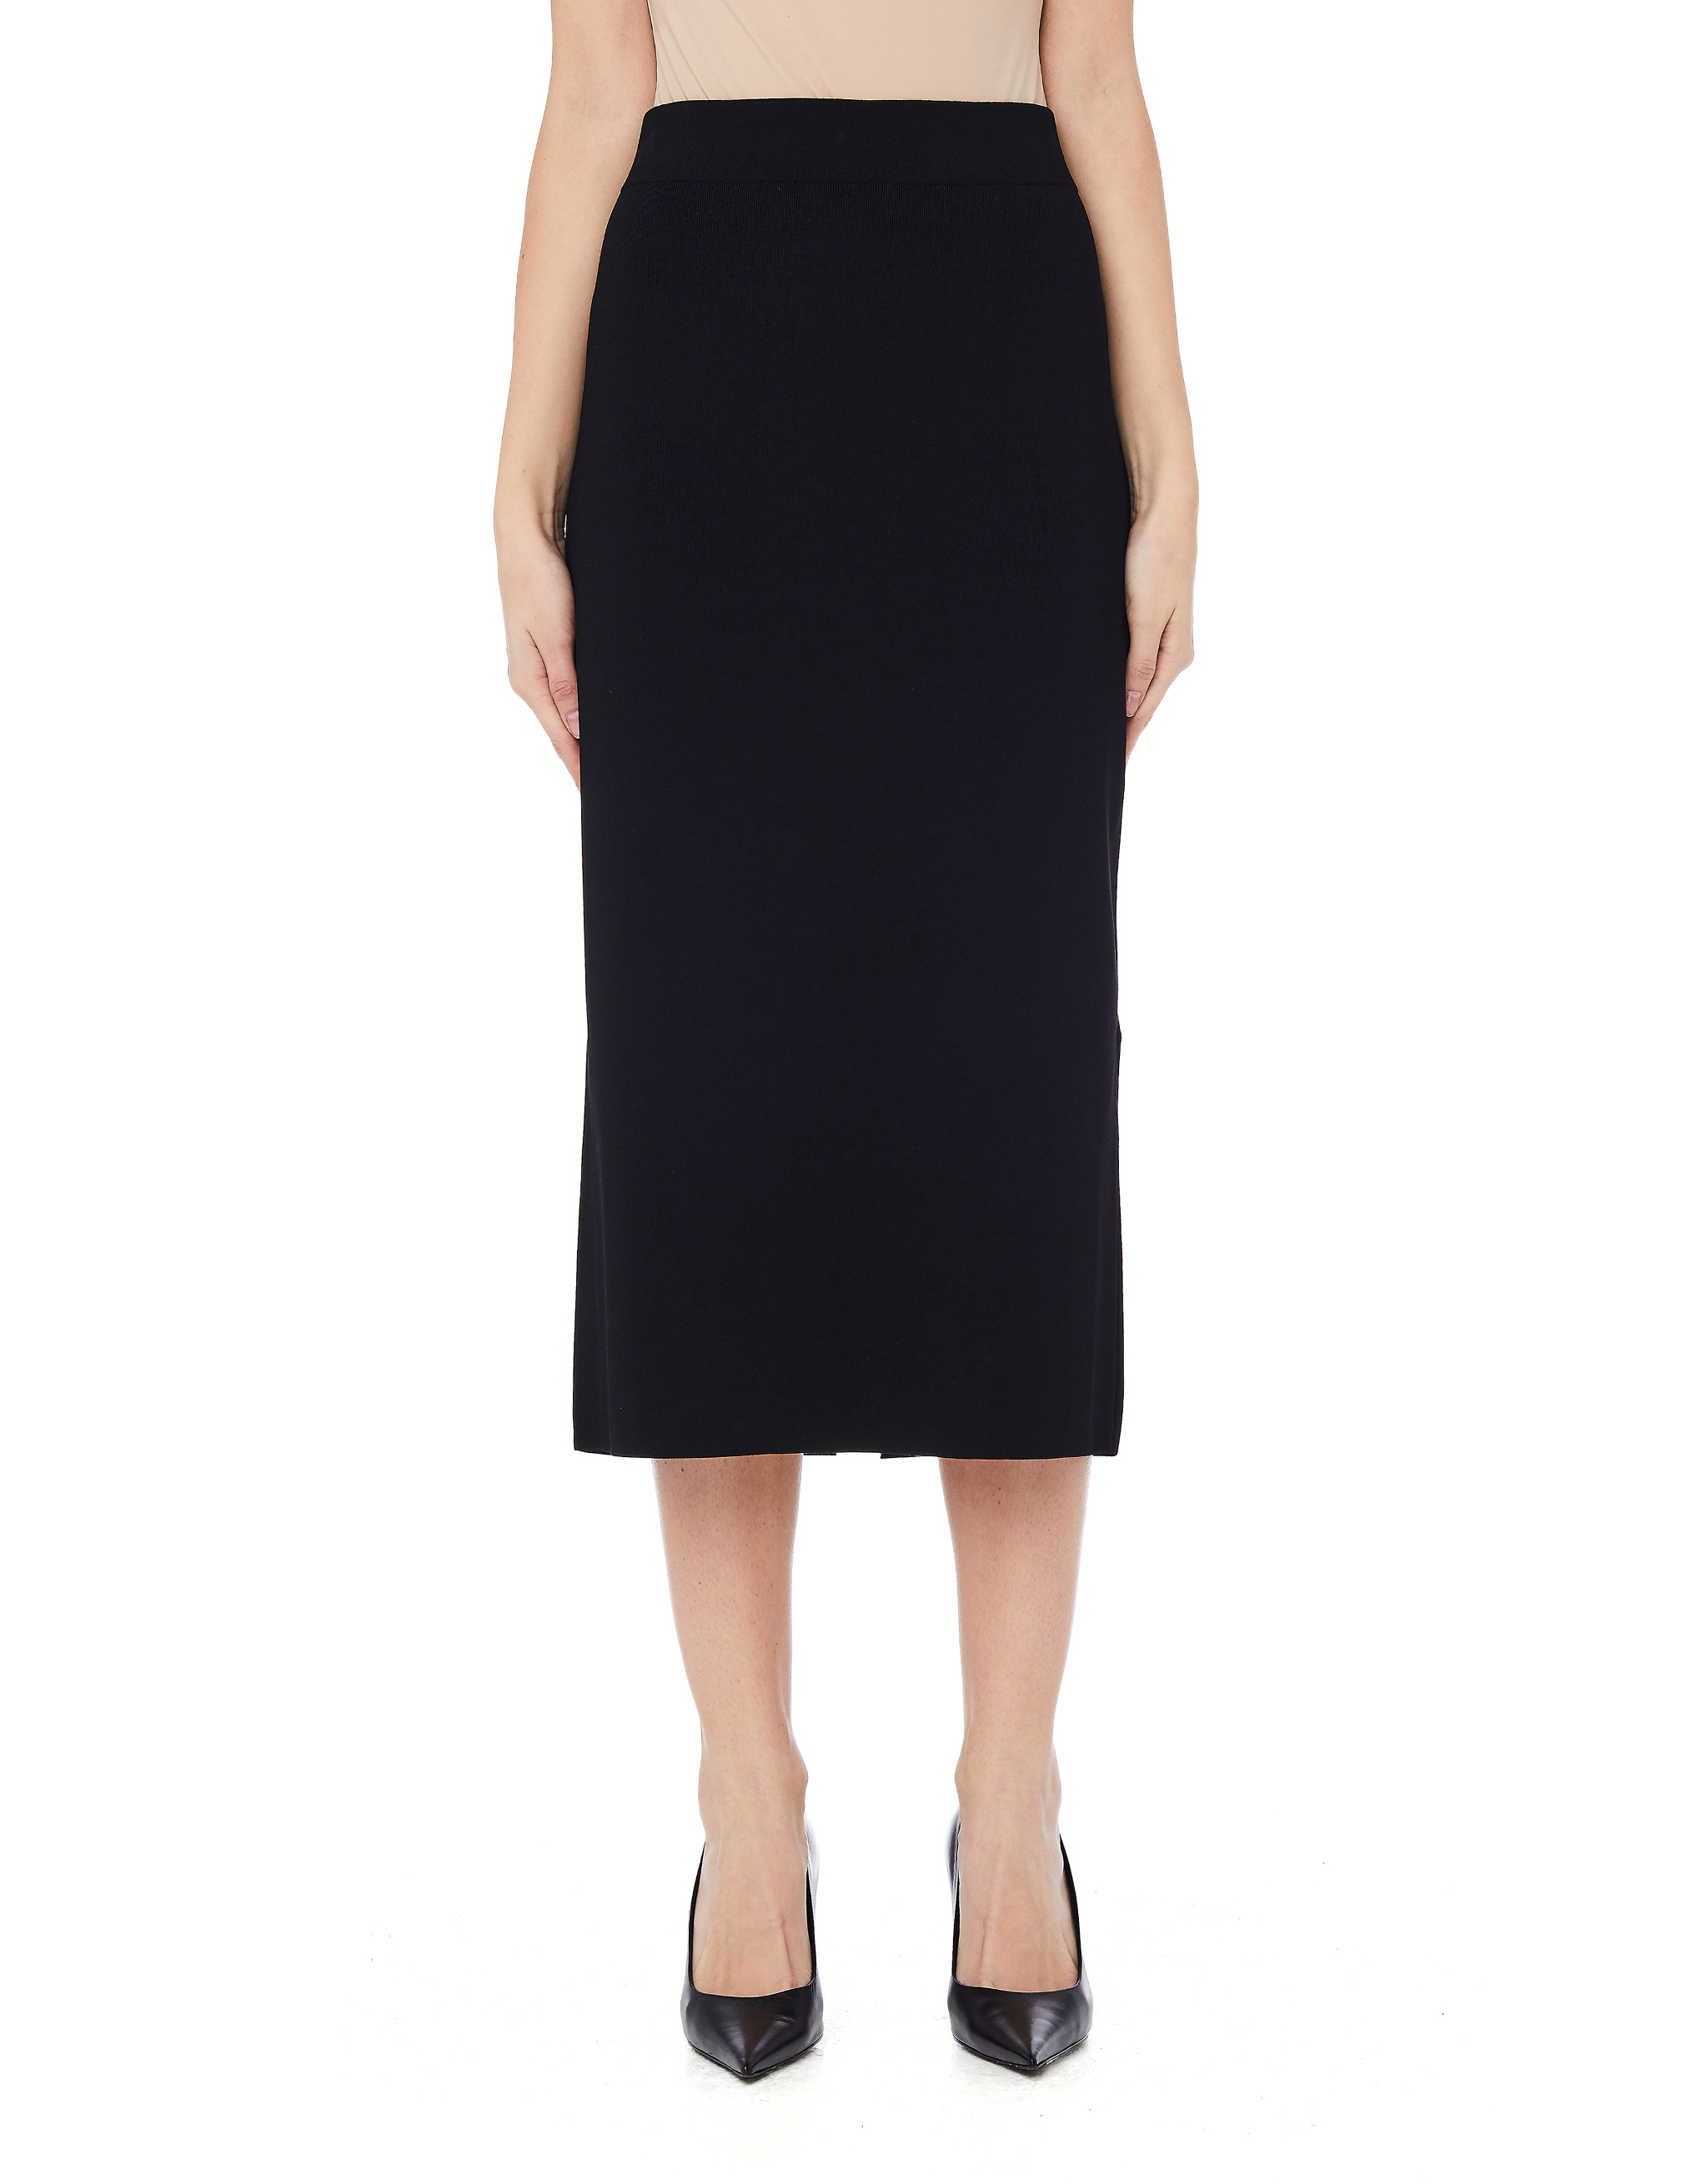 17a13c6edec9 The Row Pencil Skirt - Black   Garmentory